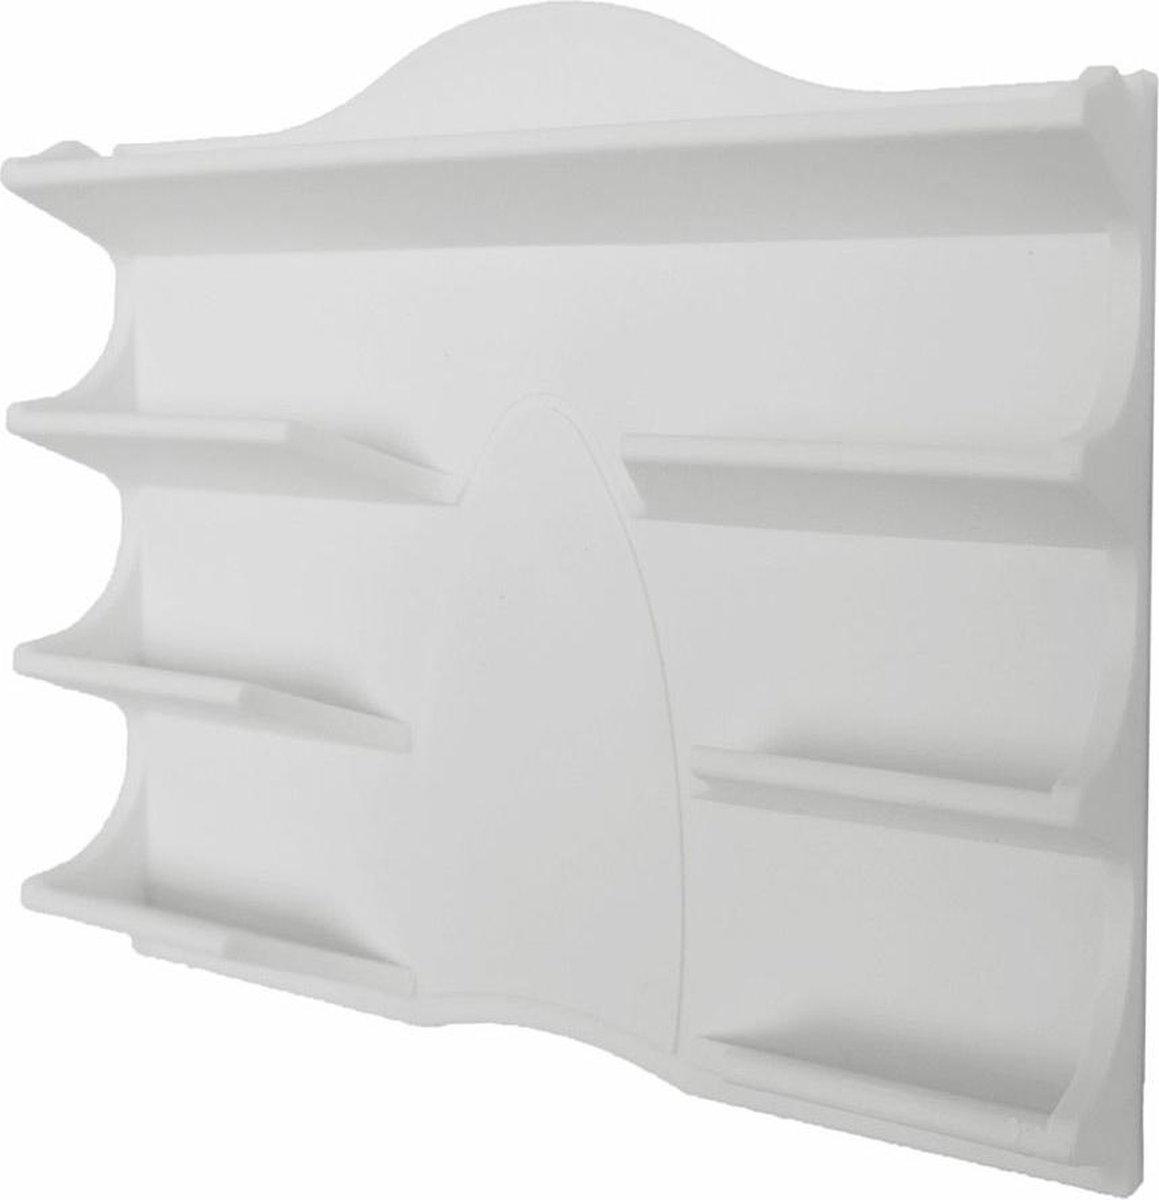 Magnetische markerhouder voor Whiteboard - Magneetbord - Planbord